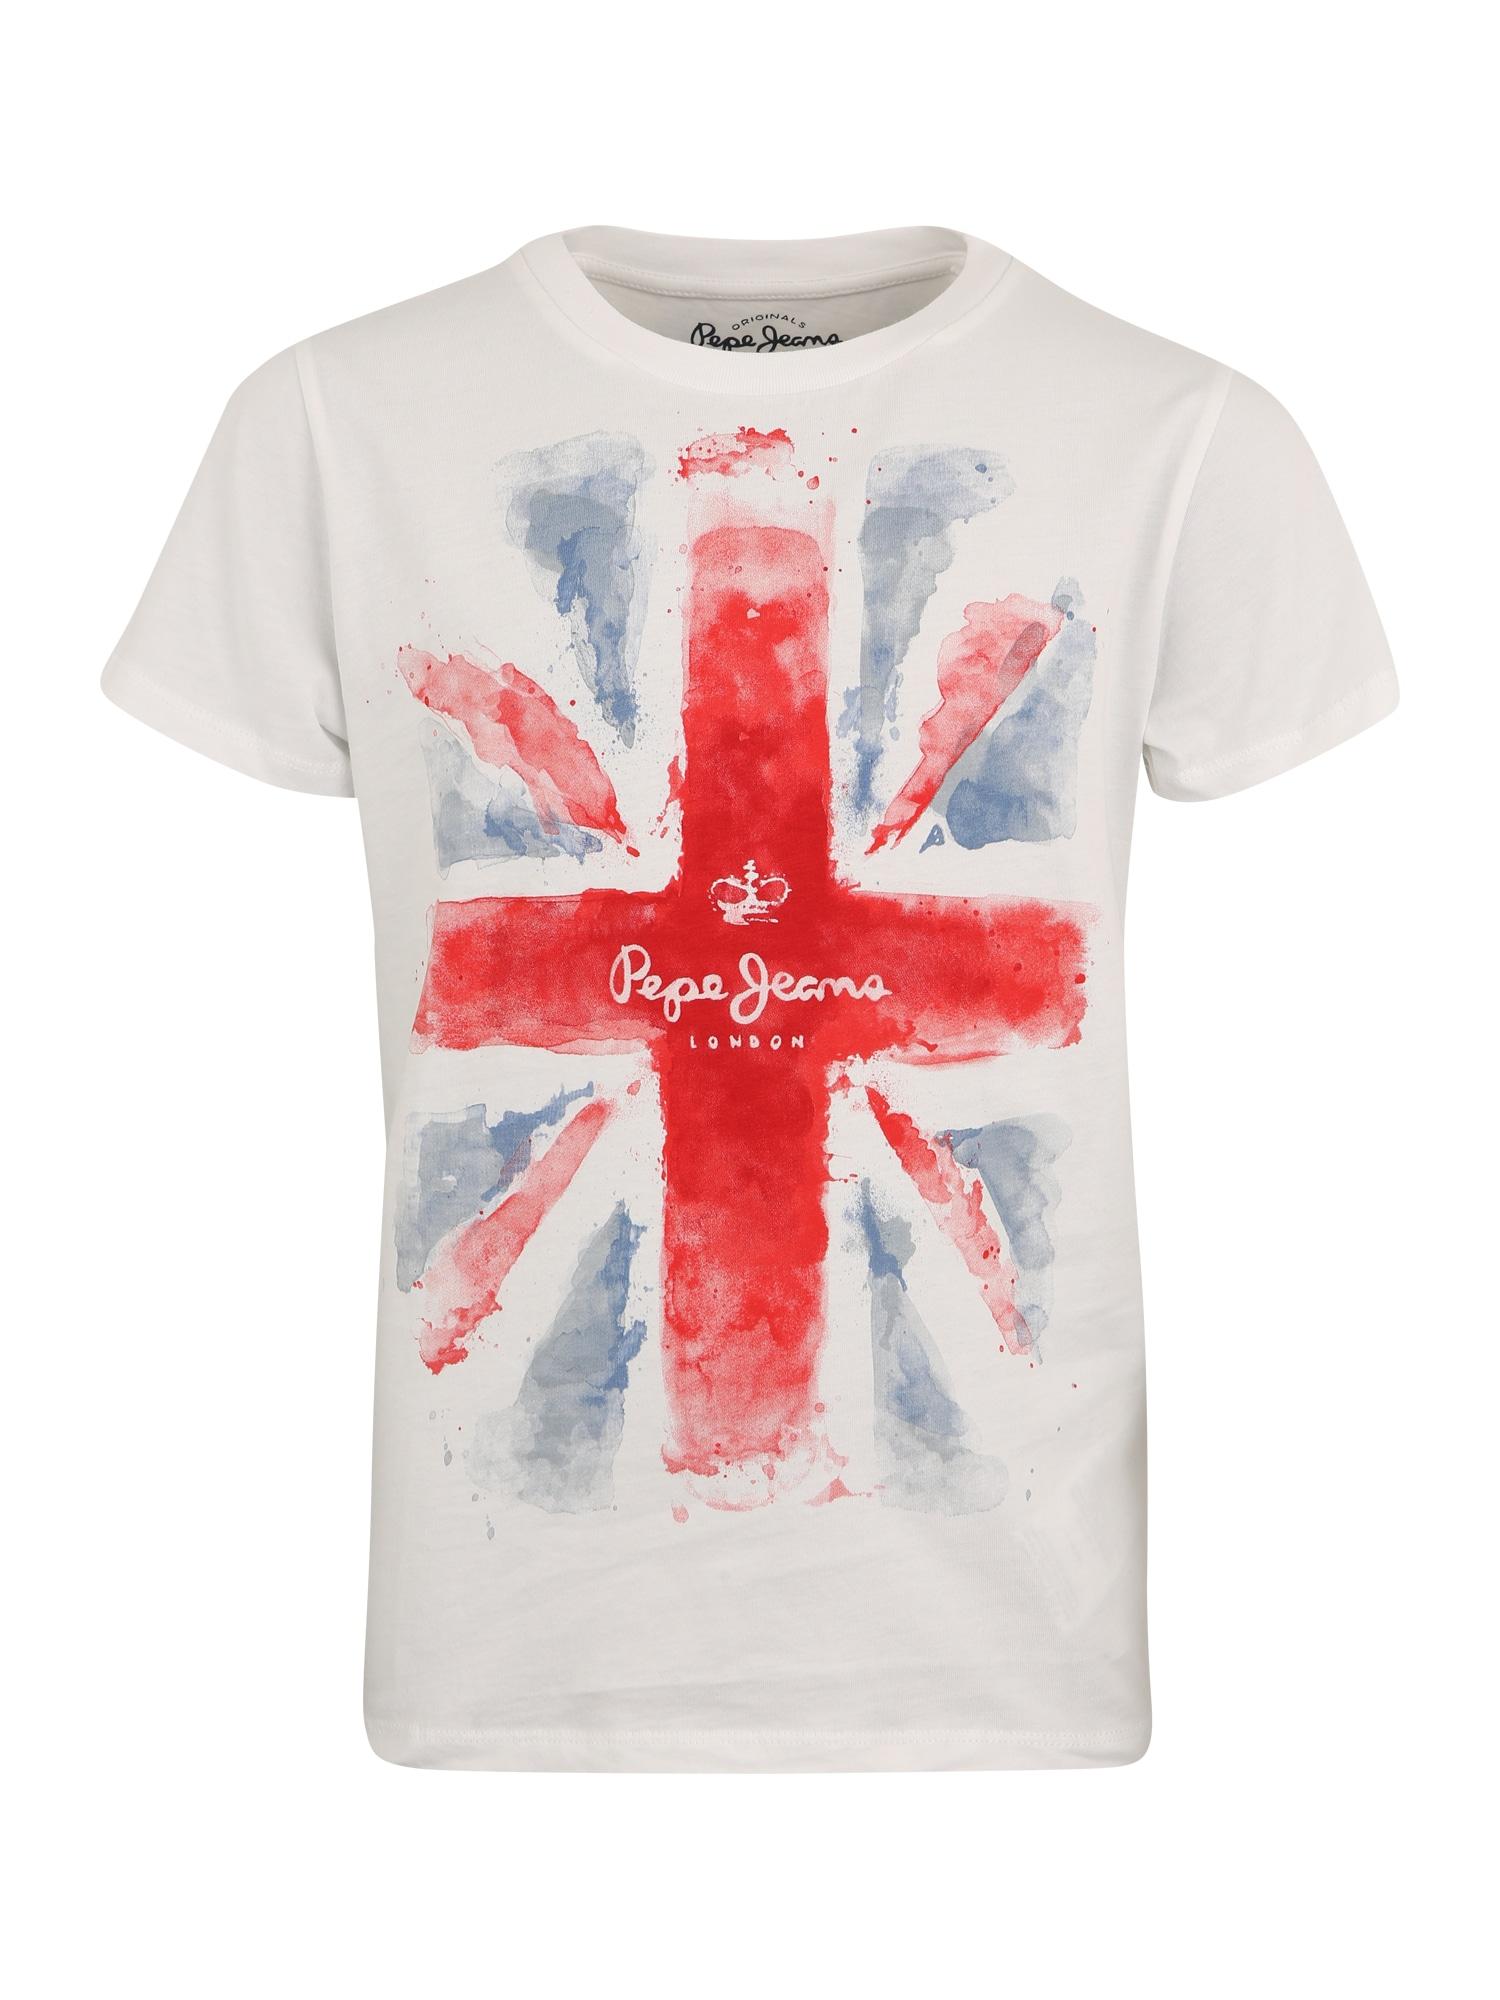 Pepe Jeans Jongens Shirt blue denim lichtrood wit